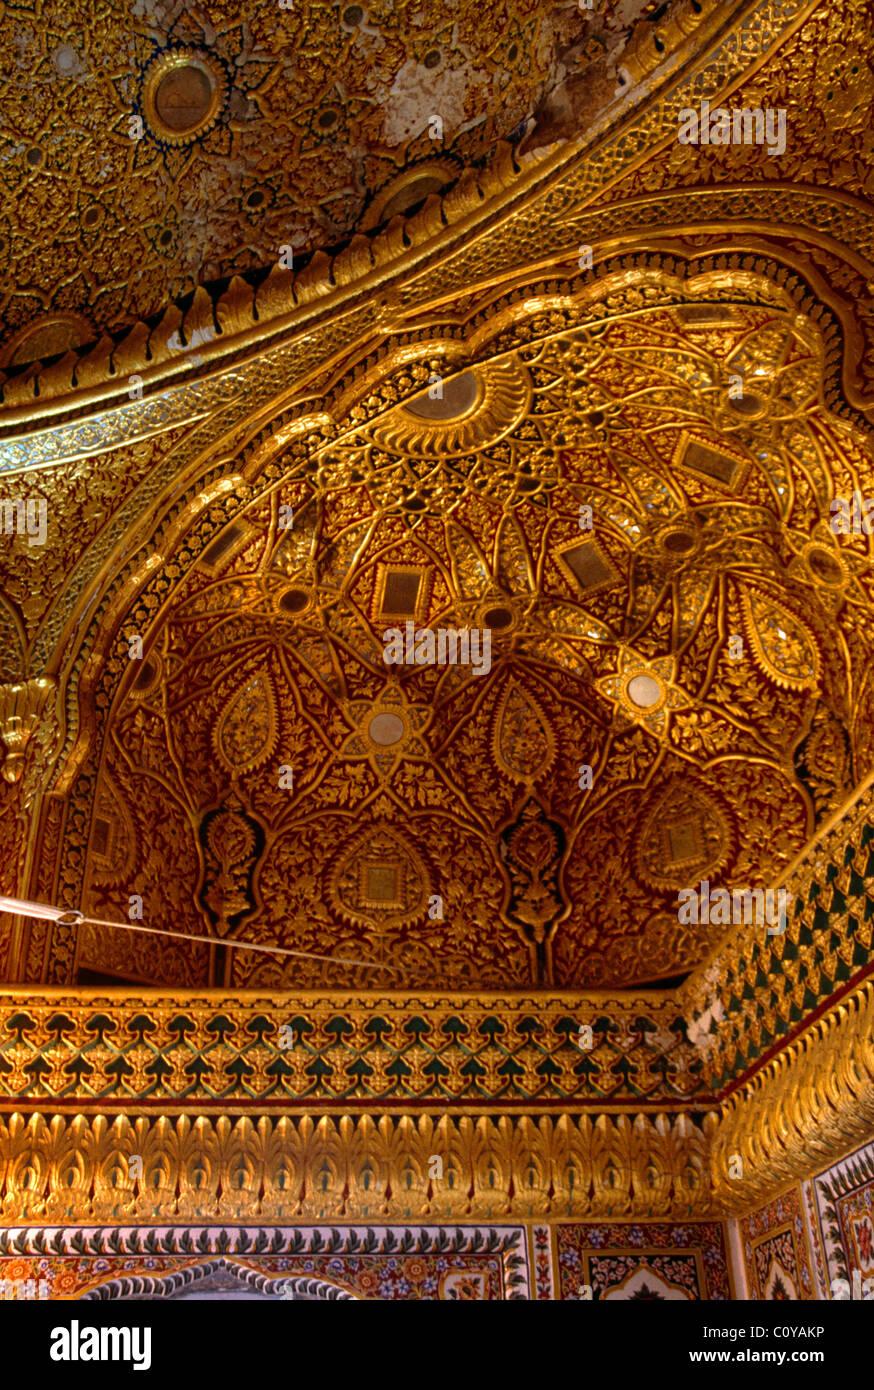 Amritsar India Sri Harmandir Golden Temple Second Floor Detail Of Gold Work - Stock Image